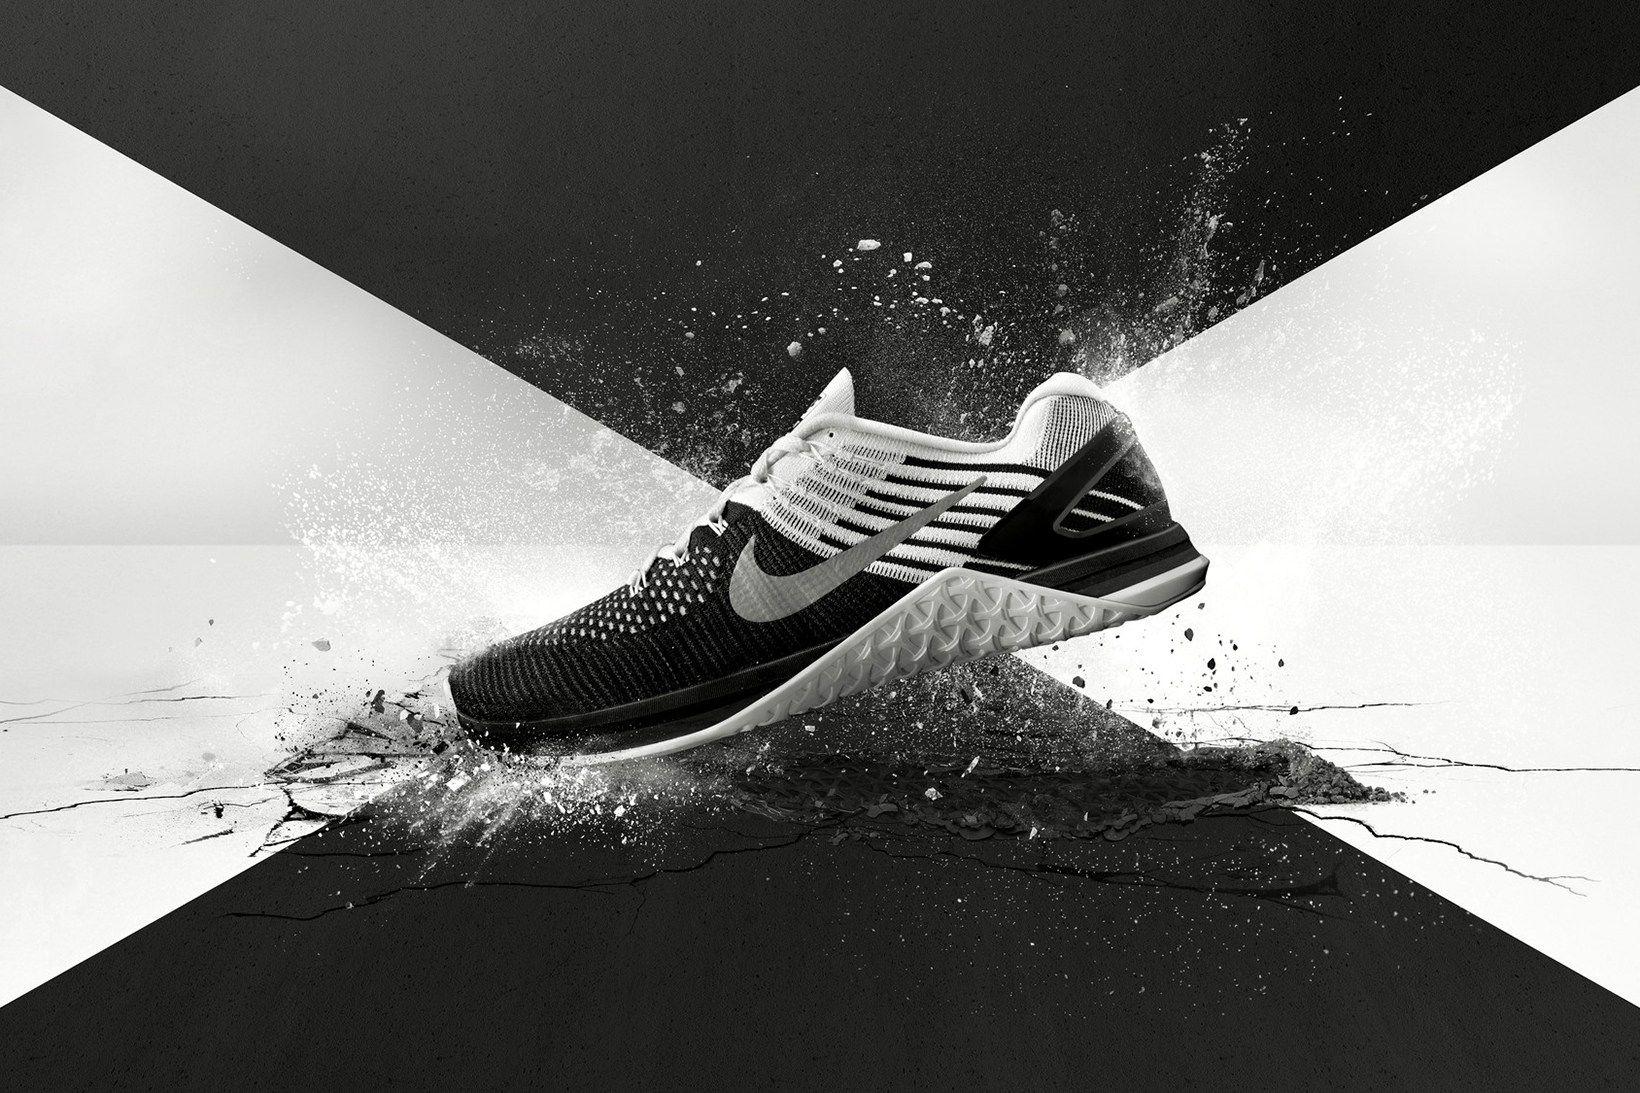 Nike Metcon 3 Nike Metcon 3 DSX Flyknit